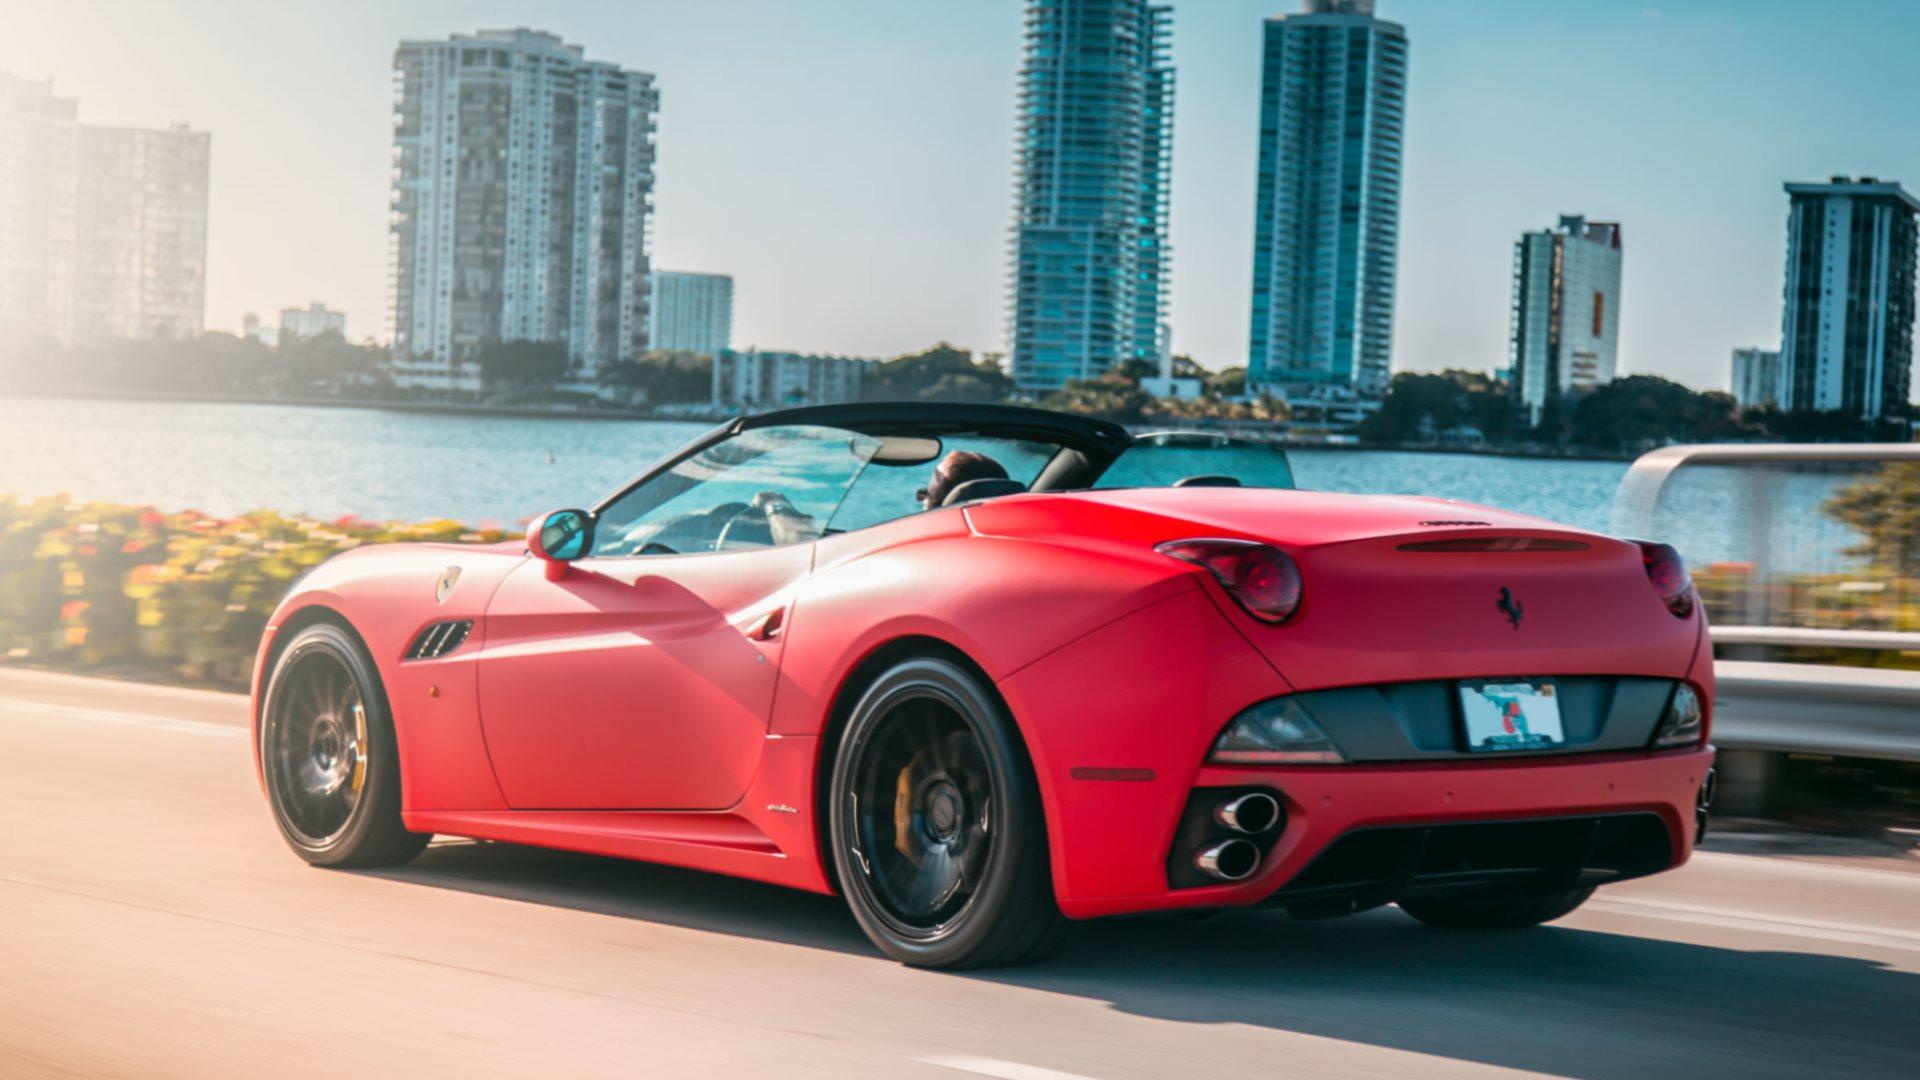 One Dream Car: Ferrari California HD